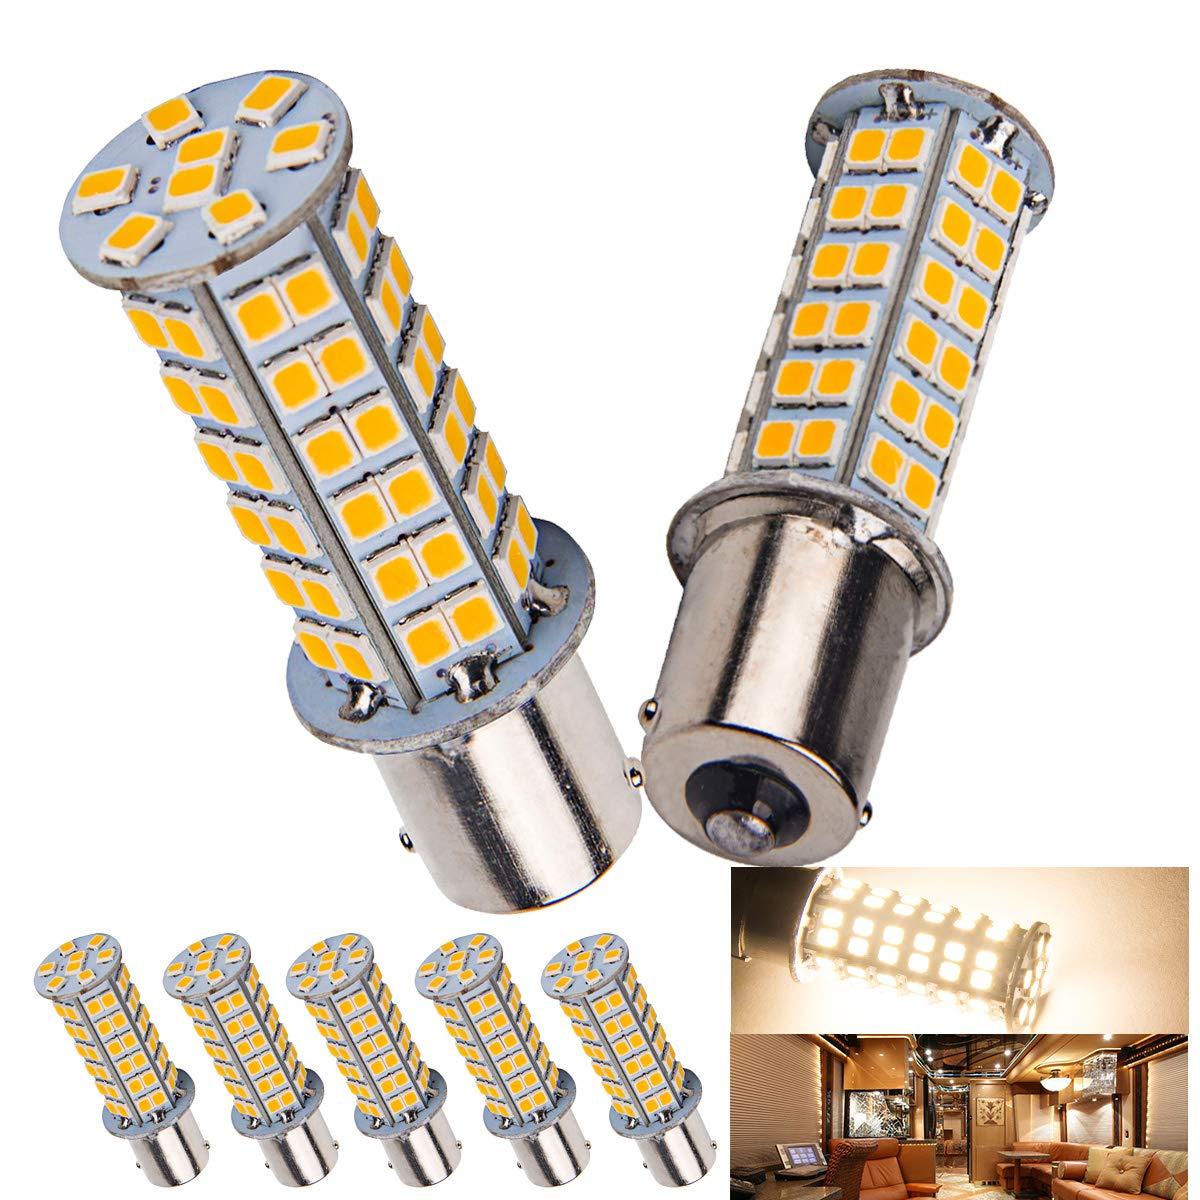 5 x 1141 Interior Light Bulbs Replacement BA15S 1156 80 SMD LED 1003 900 Lumens RV Turn Signal Backup Reverse,Xenon White